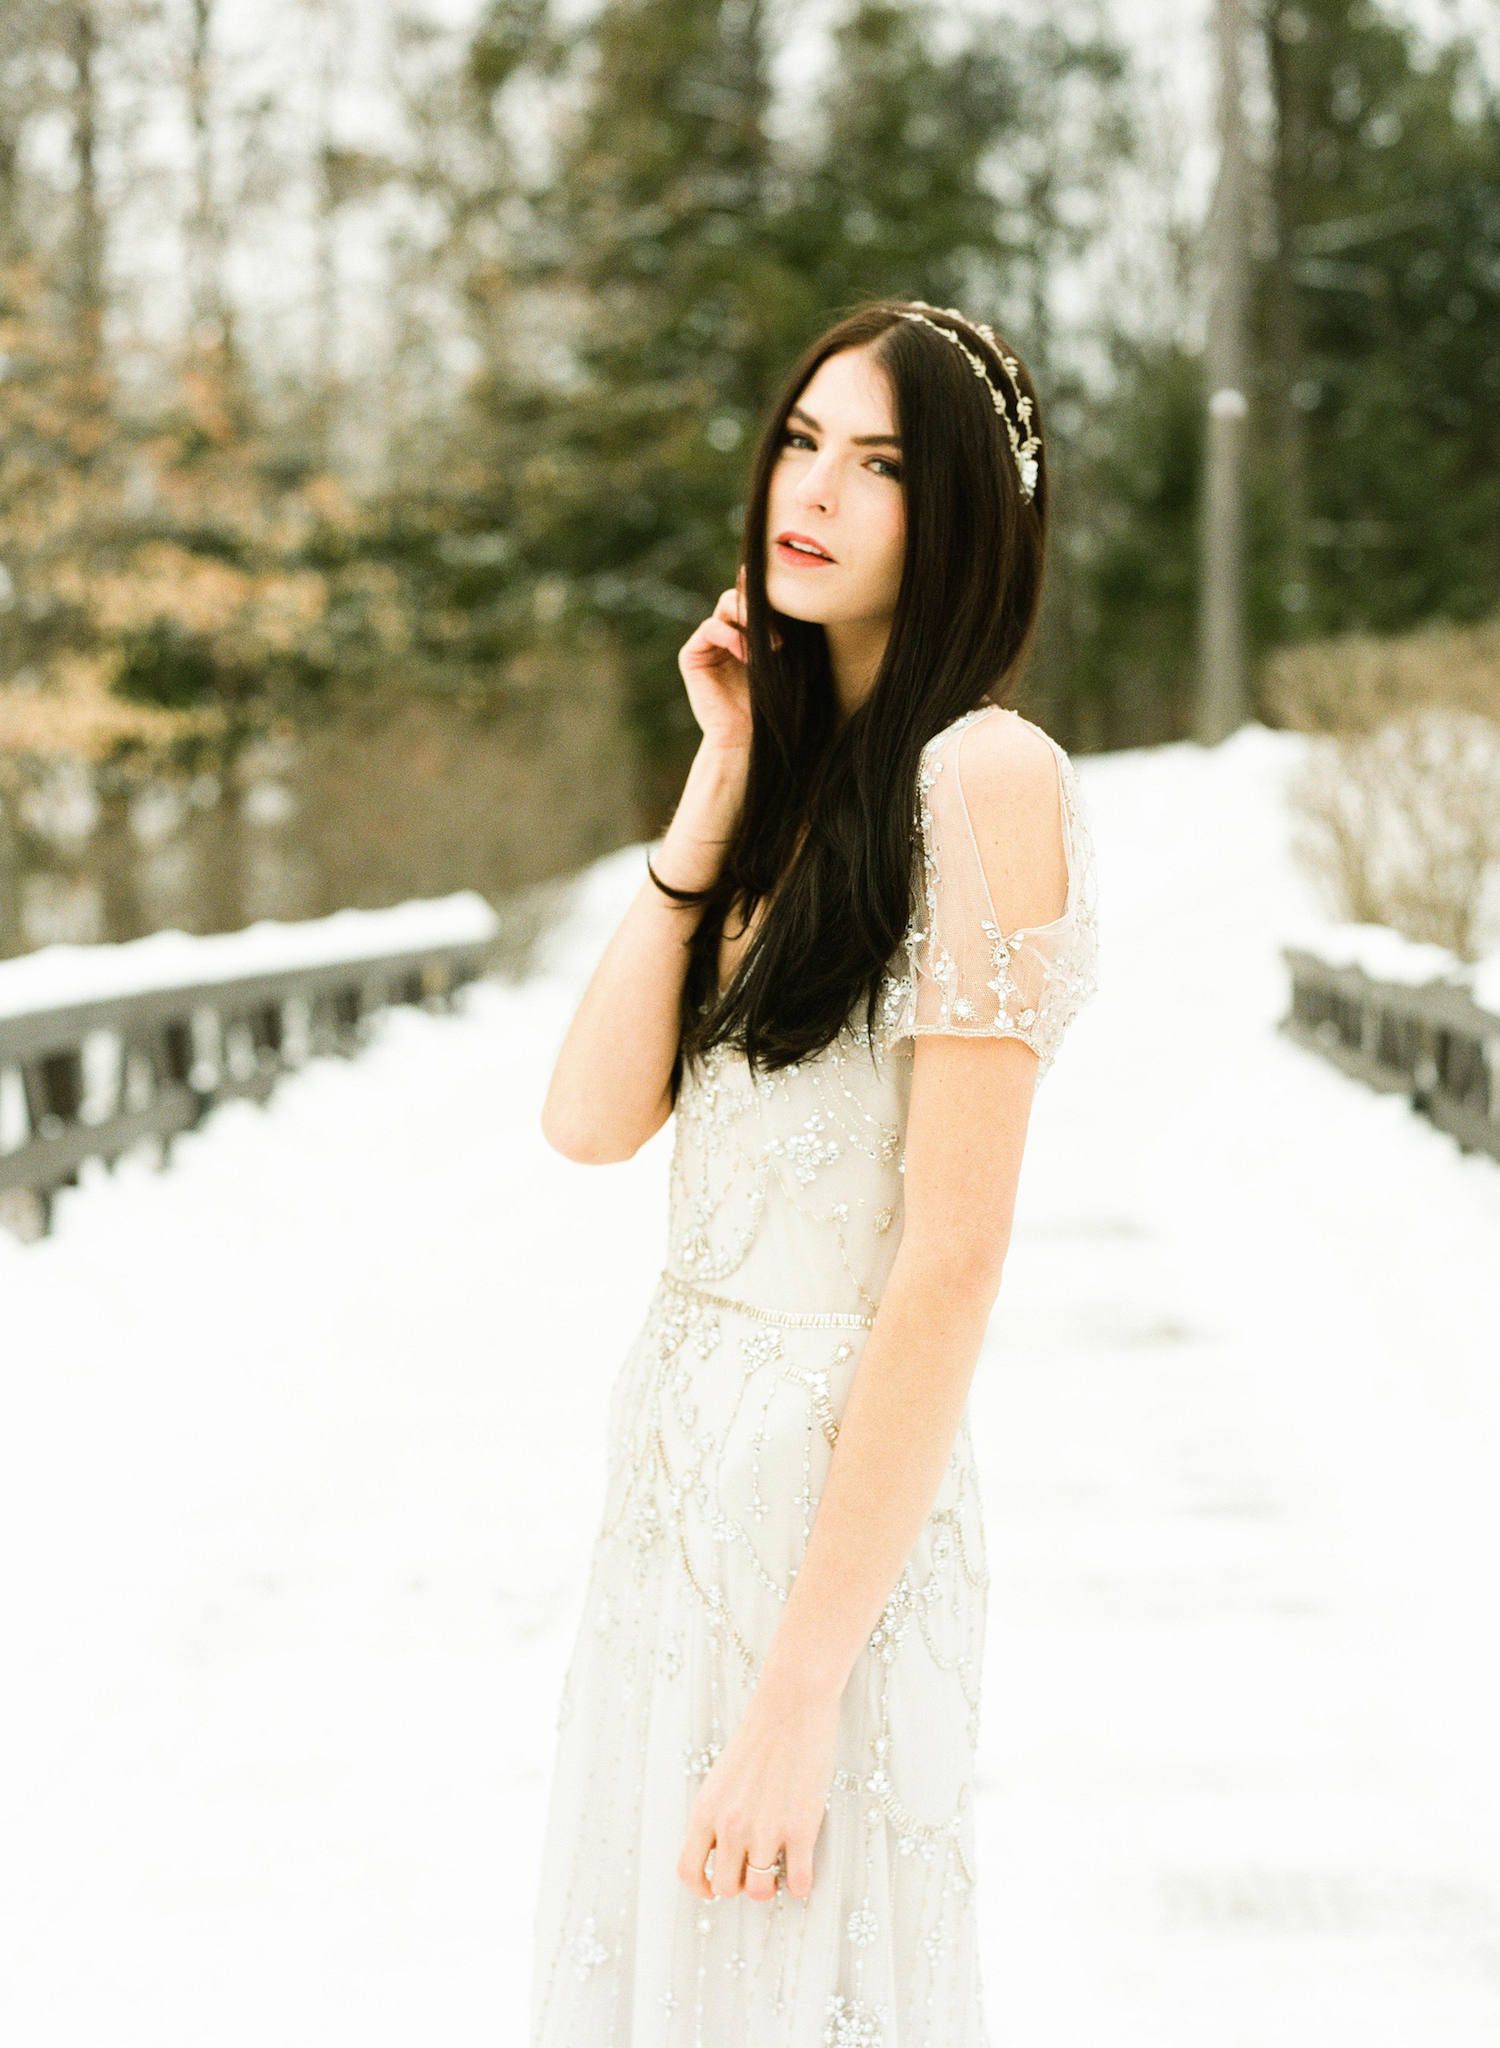 Winter Editorial-JennyPackham-LindsayMaddenPhotography-27 copy.jpg